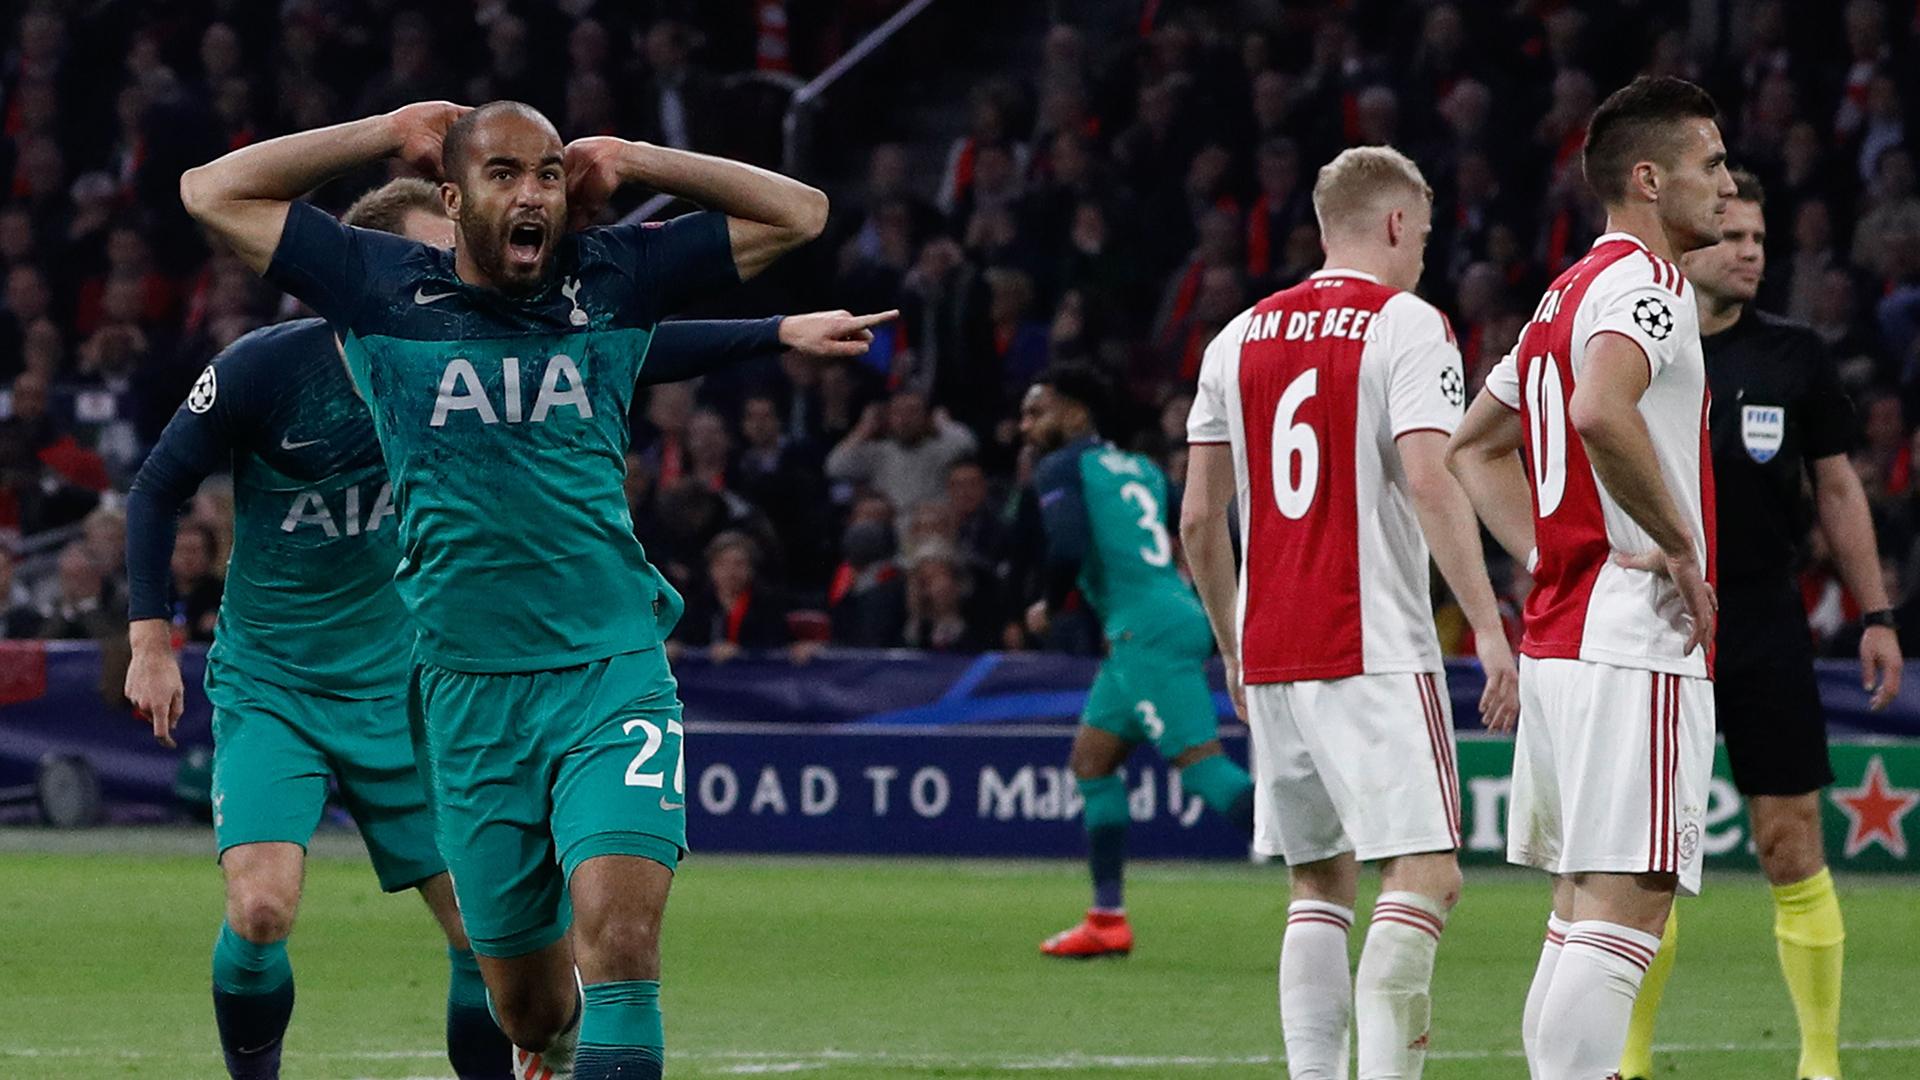 Beers, tears & disbelief: Spurs destroy Ajax's 'destiny' in Champions League classic